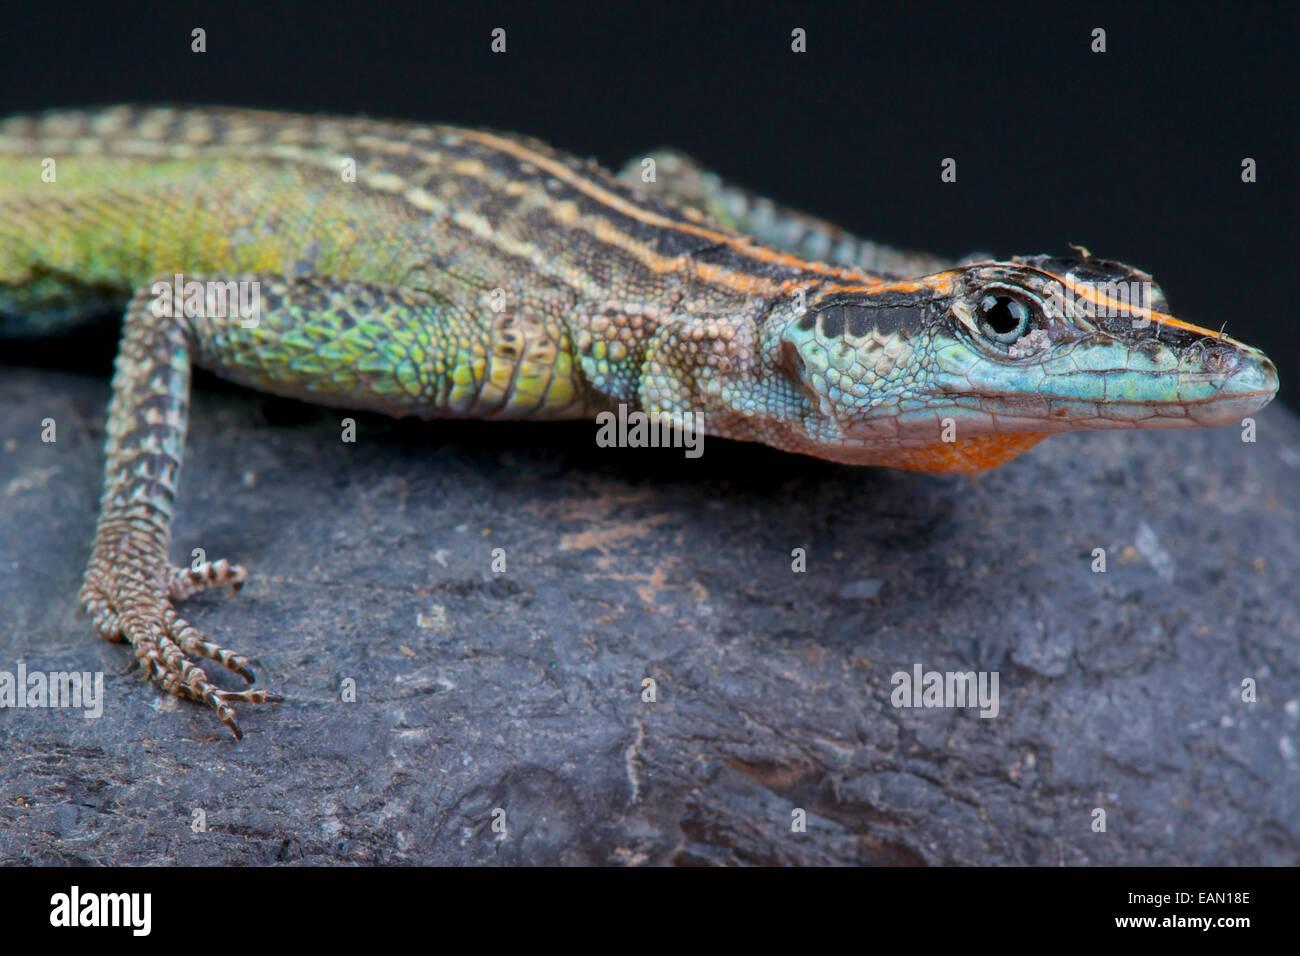 Flat rock lizard / Platysaurus Torquatus Immagini Stock